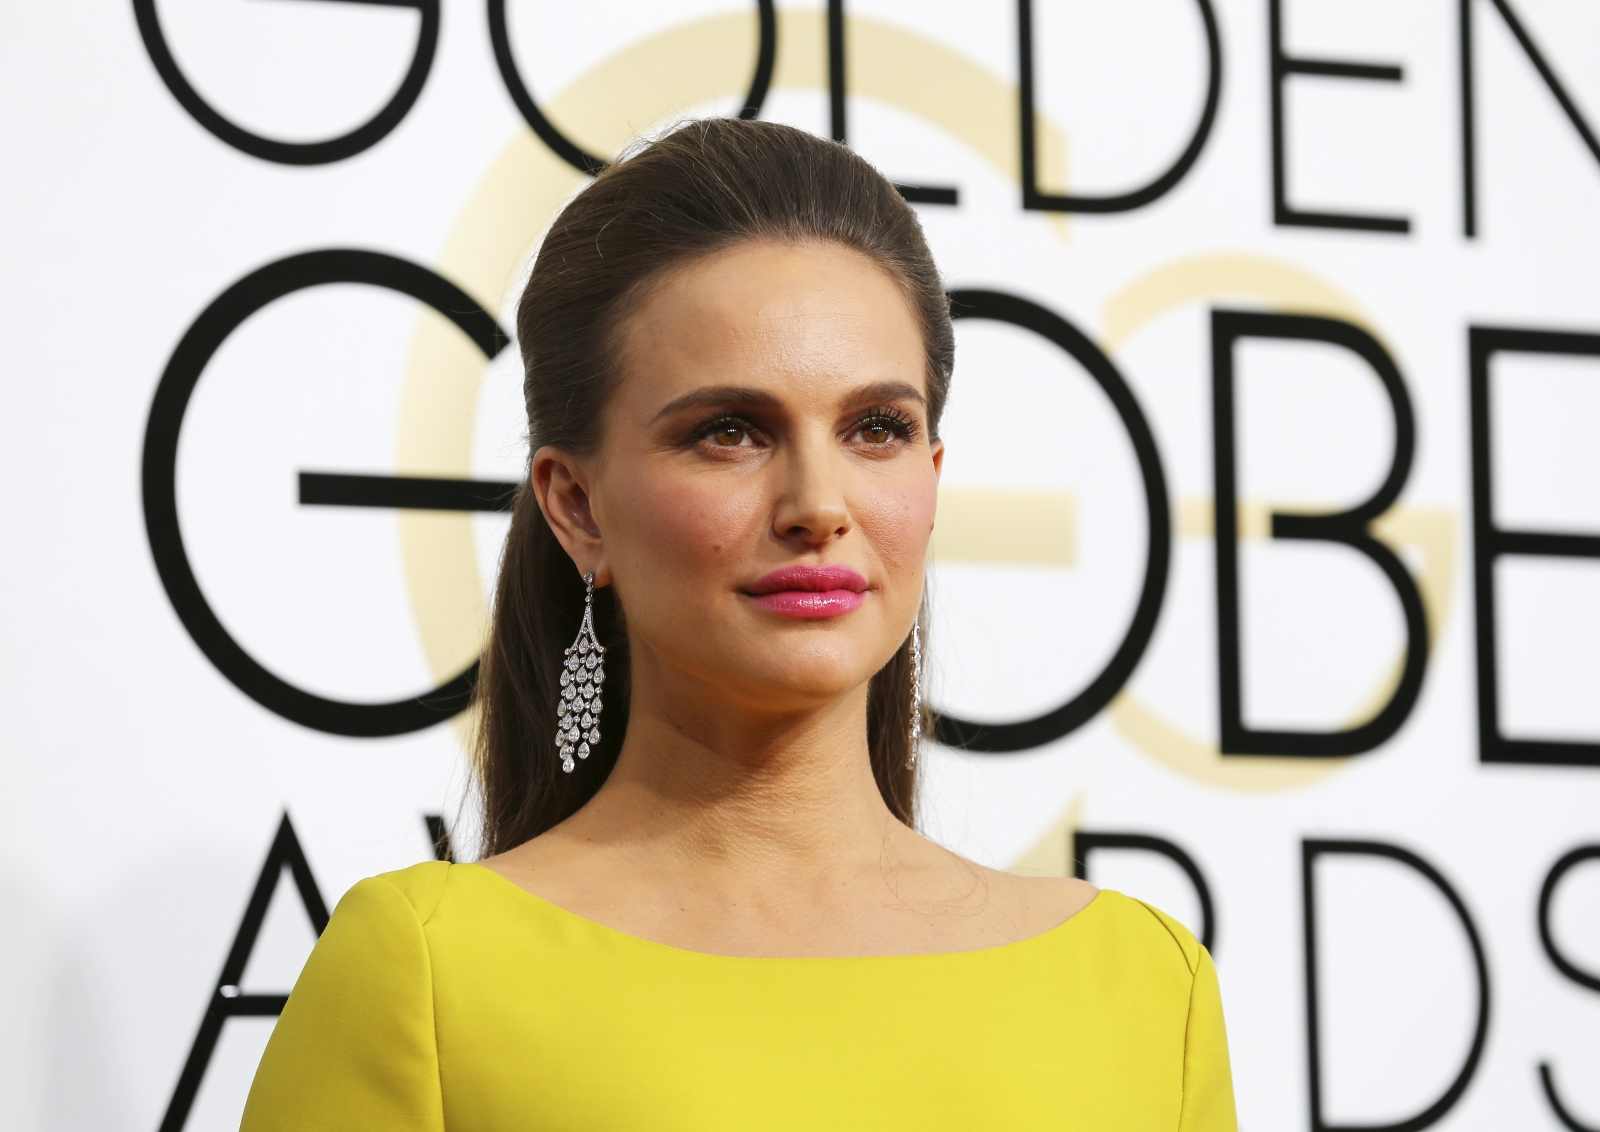 Natalie Portman Won't Attend Oscars, Spirit Awards Due to Pregnancy